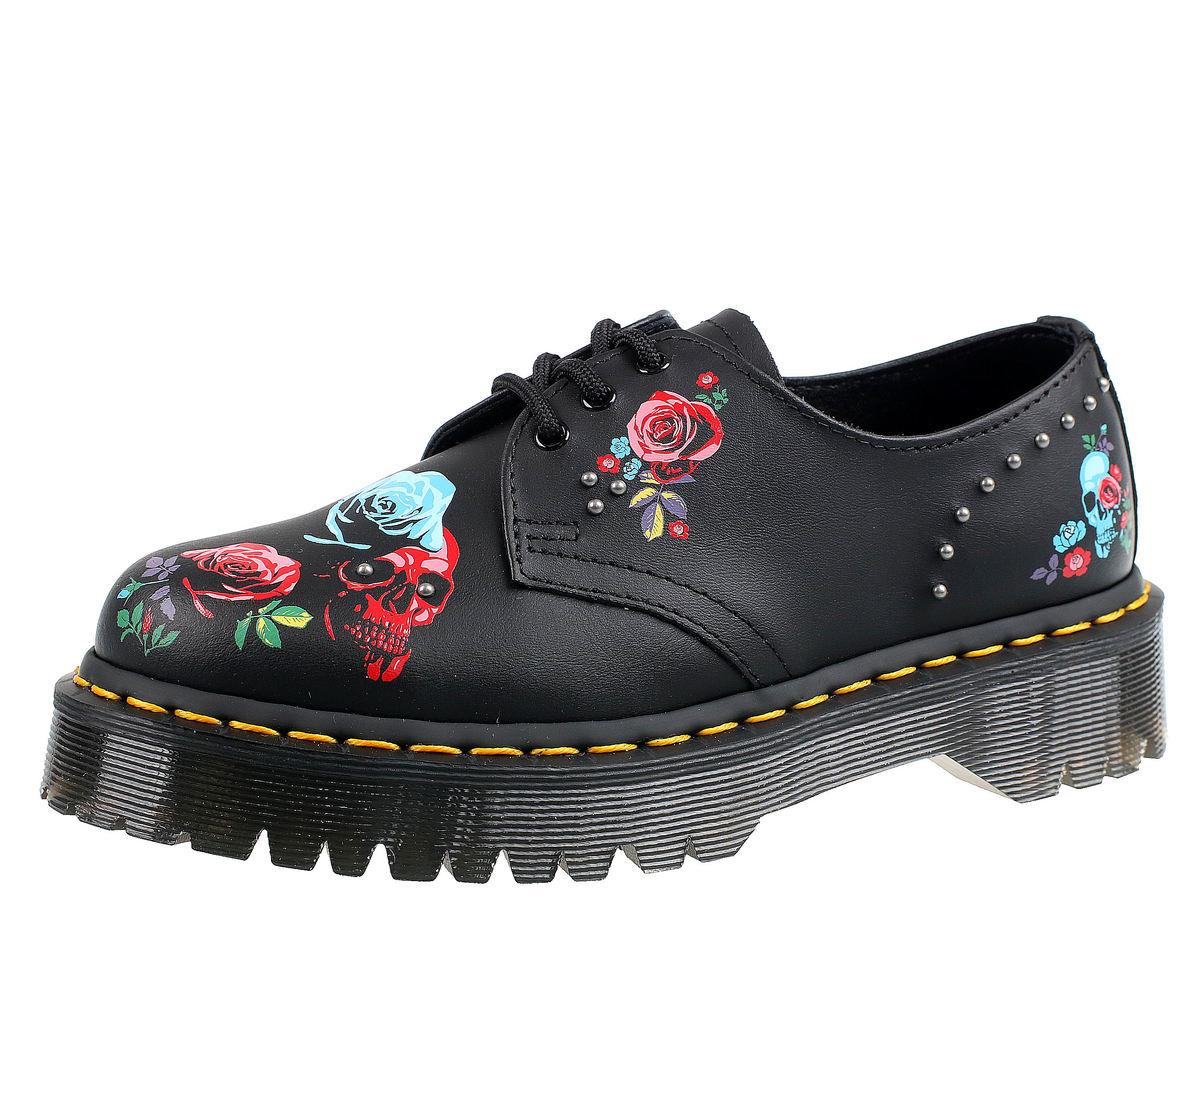 topánky DR.MARTENS - 3 dierkové - PASCAL BEX ROSE BLACK MULTI - DM24422001